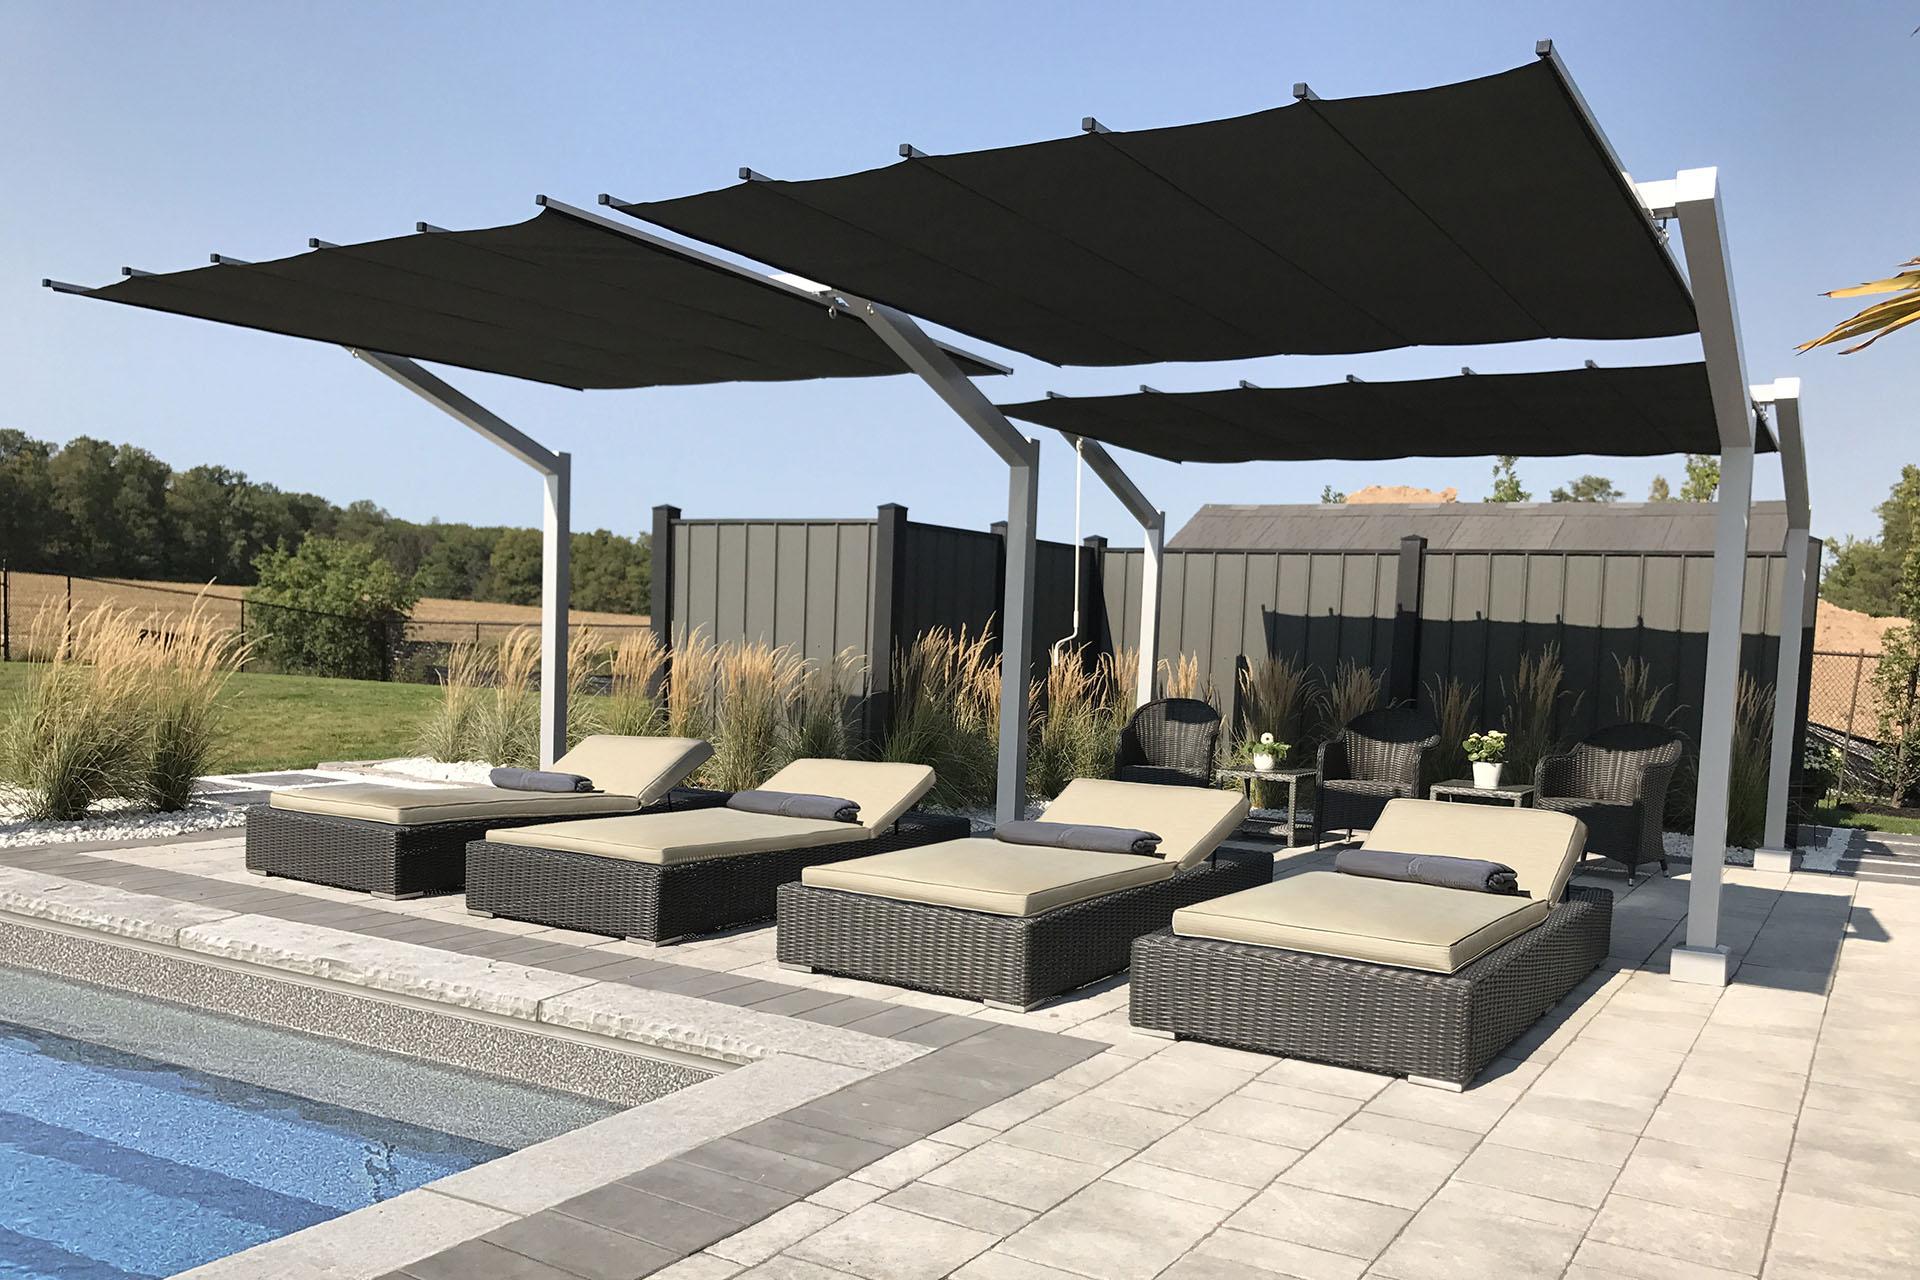 Freestanding Retractable Canopy, Milton - ShadeFX